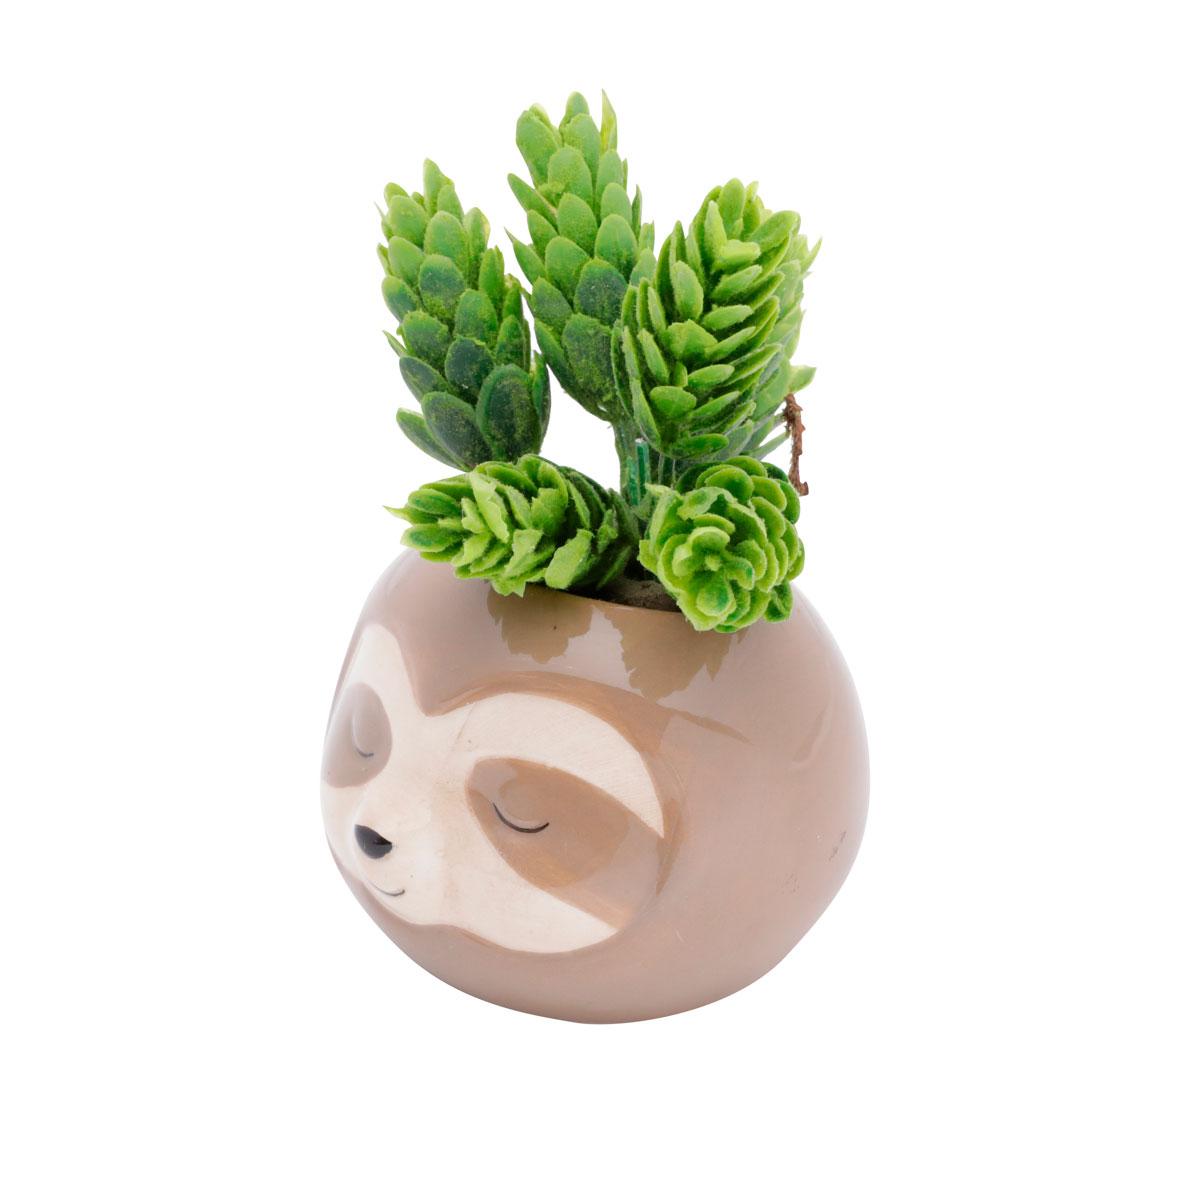 Cachepot Vaso Decorativo Preguiça Fofa - Presente Super